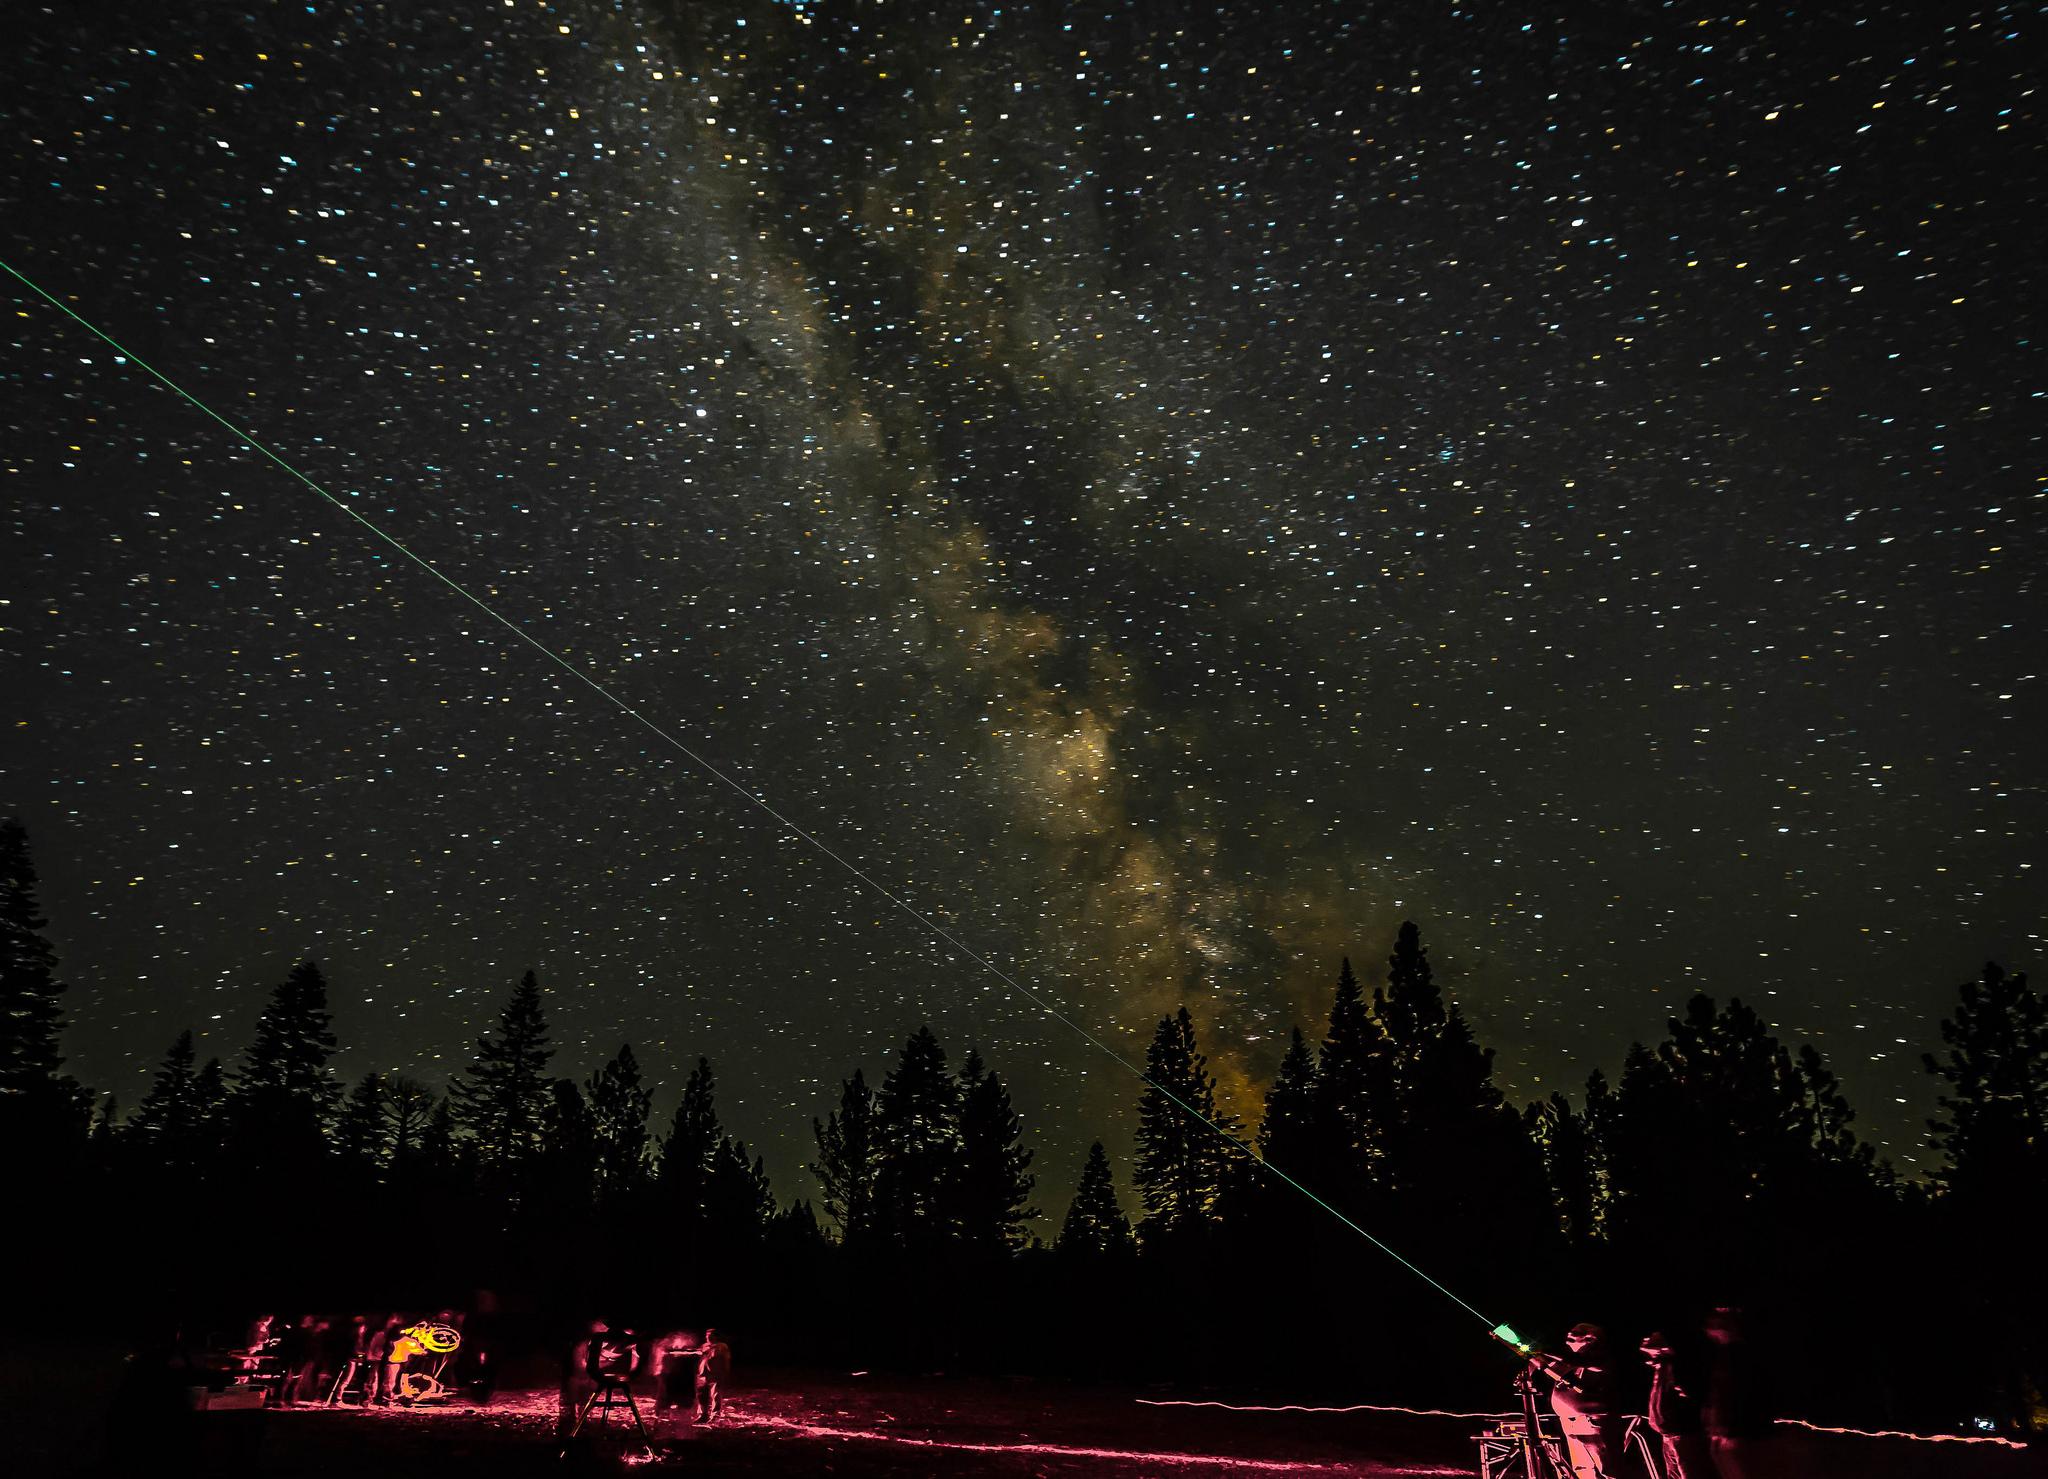 Lassen Dark Sky Festival. Photo courtesy Lassen Volcanic National Park, by volunteer photographer Alison Taggart-Barone.